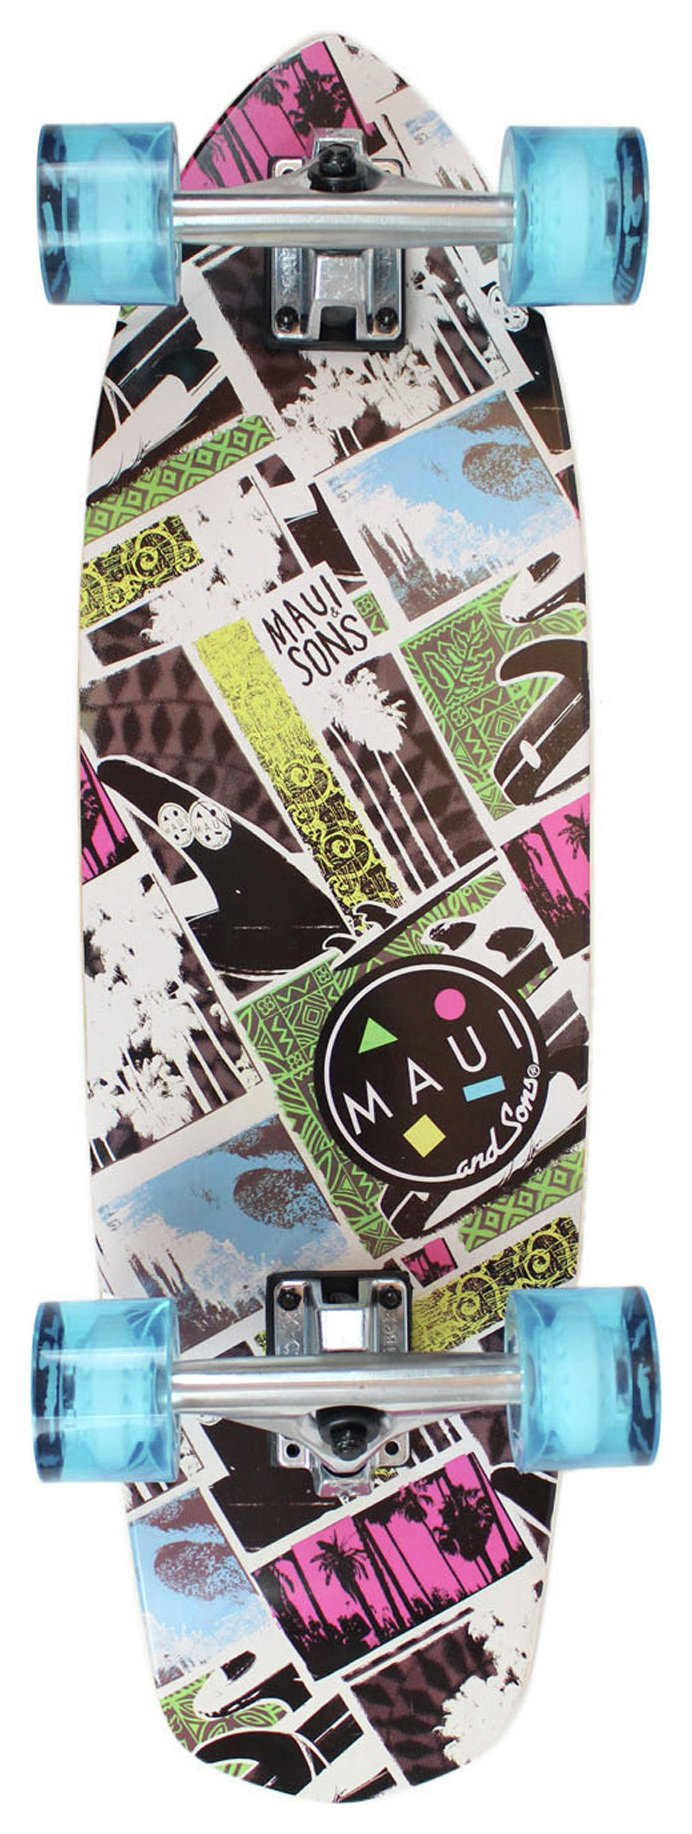 Maui and Sons Primo Cruiser Skateboard.